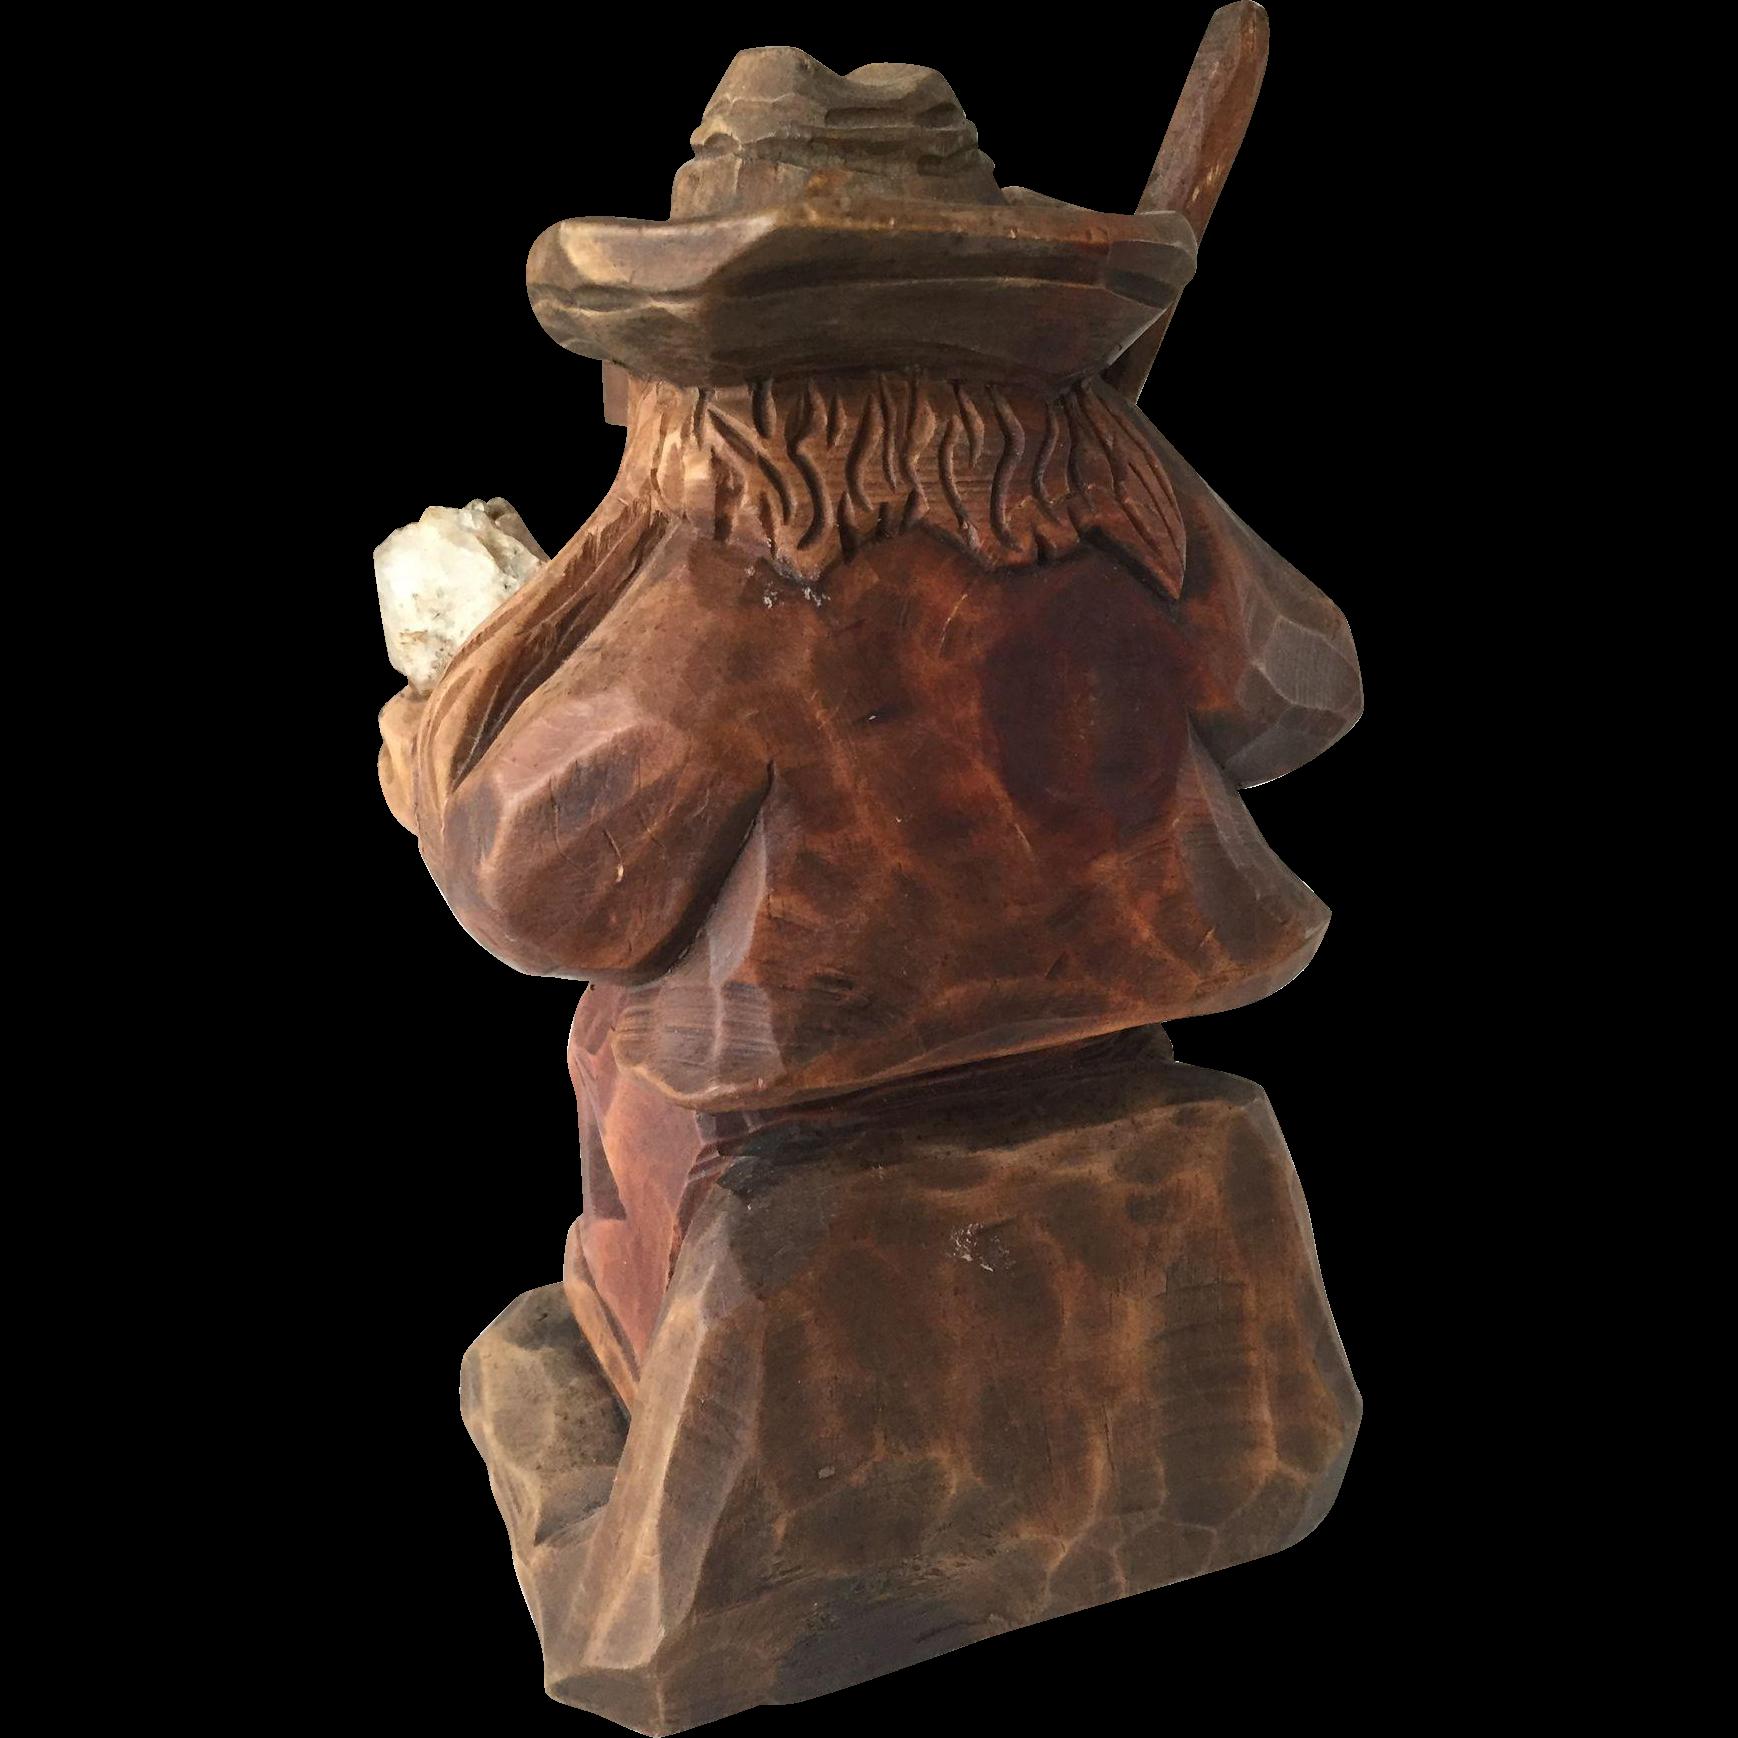 Vintage Black Forest Gnome - Troll sculpture